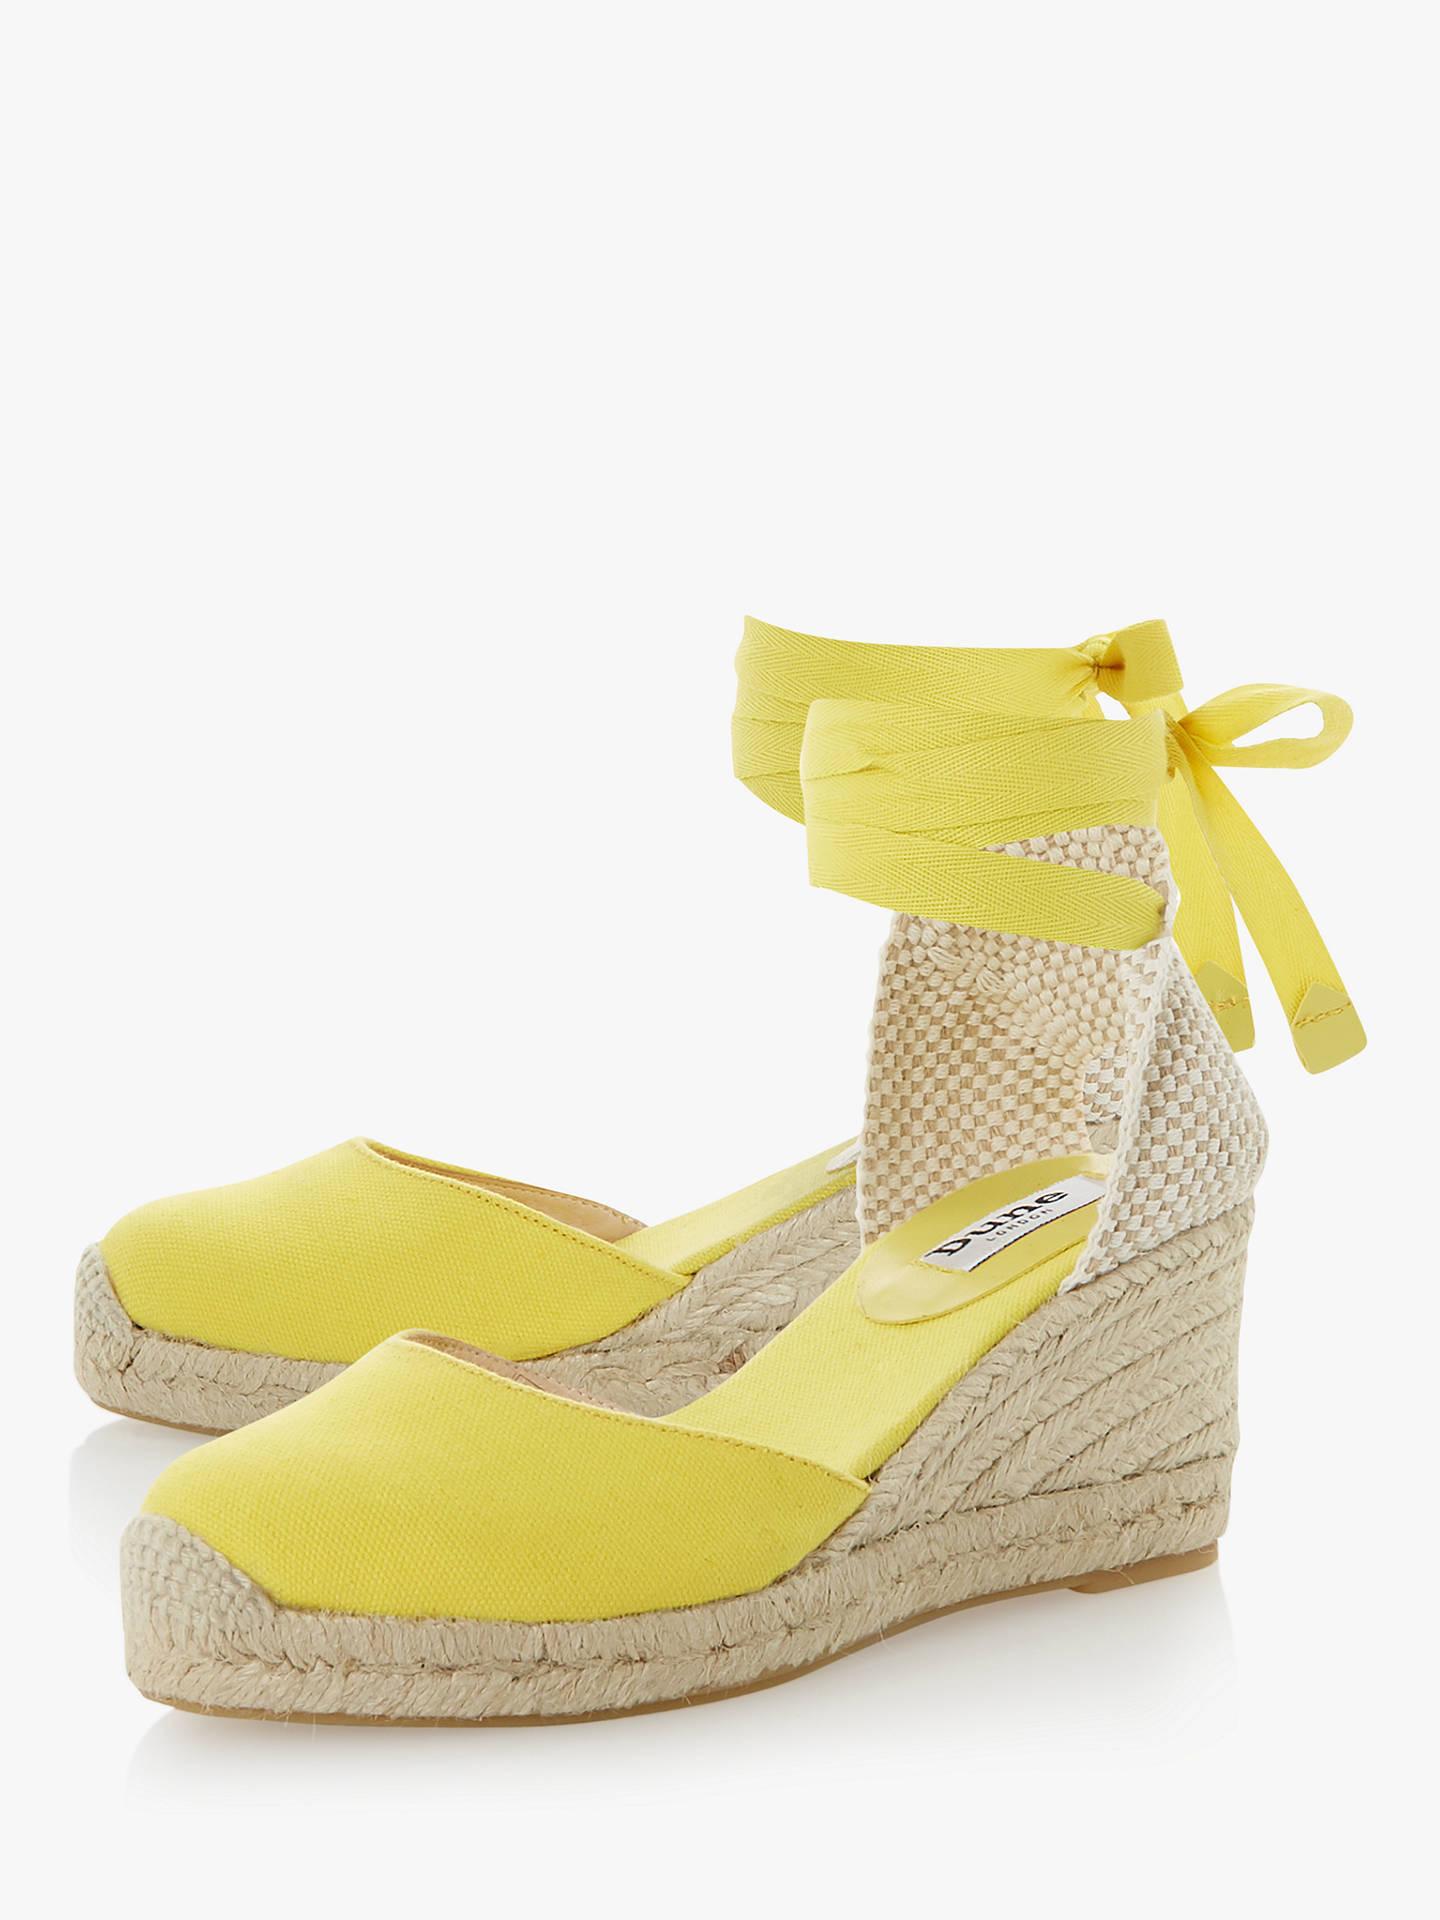 e8b84c4e33e21 ... Buy Dune Kasey Wedge Heel Espadrilles, Yellow, 4 Online at  johnlewis.com ...